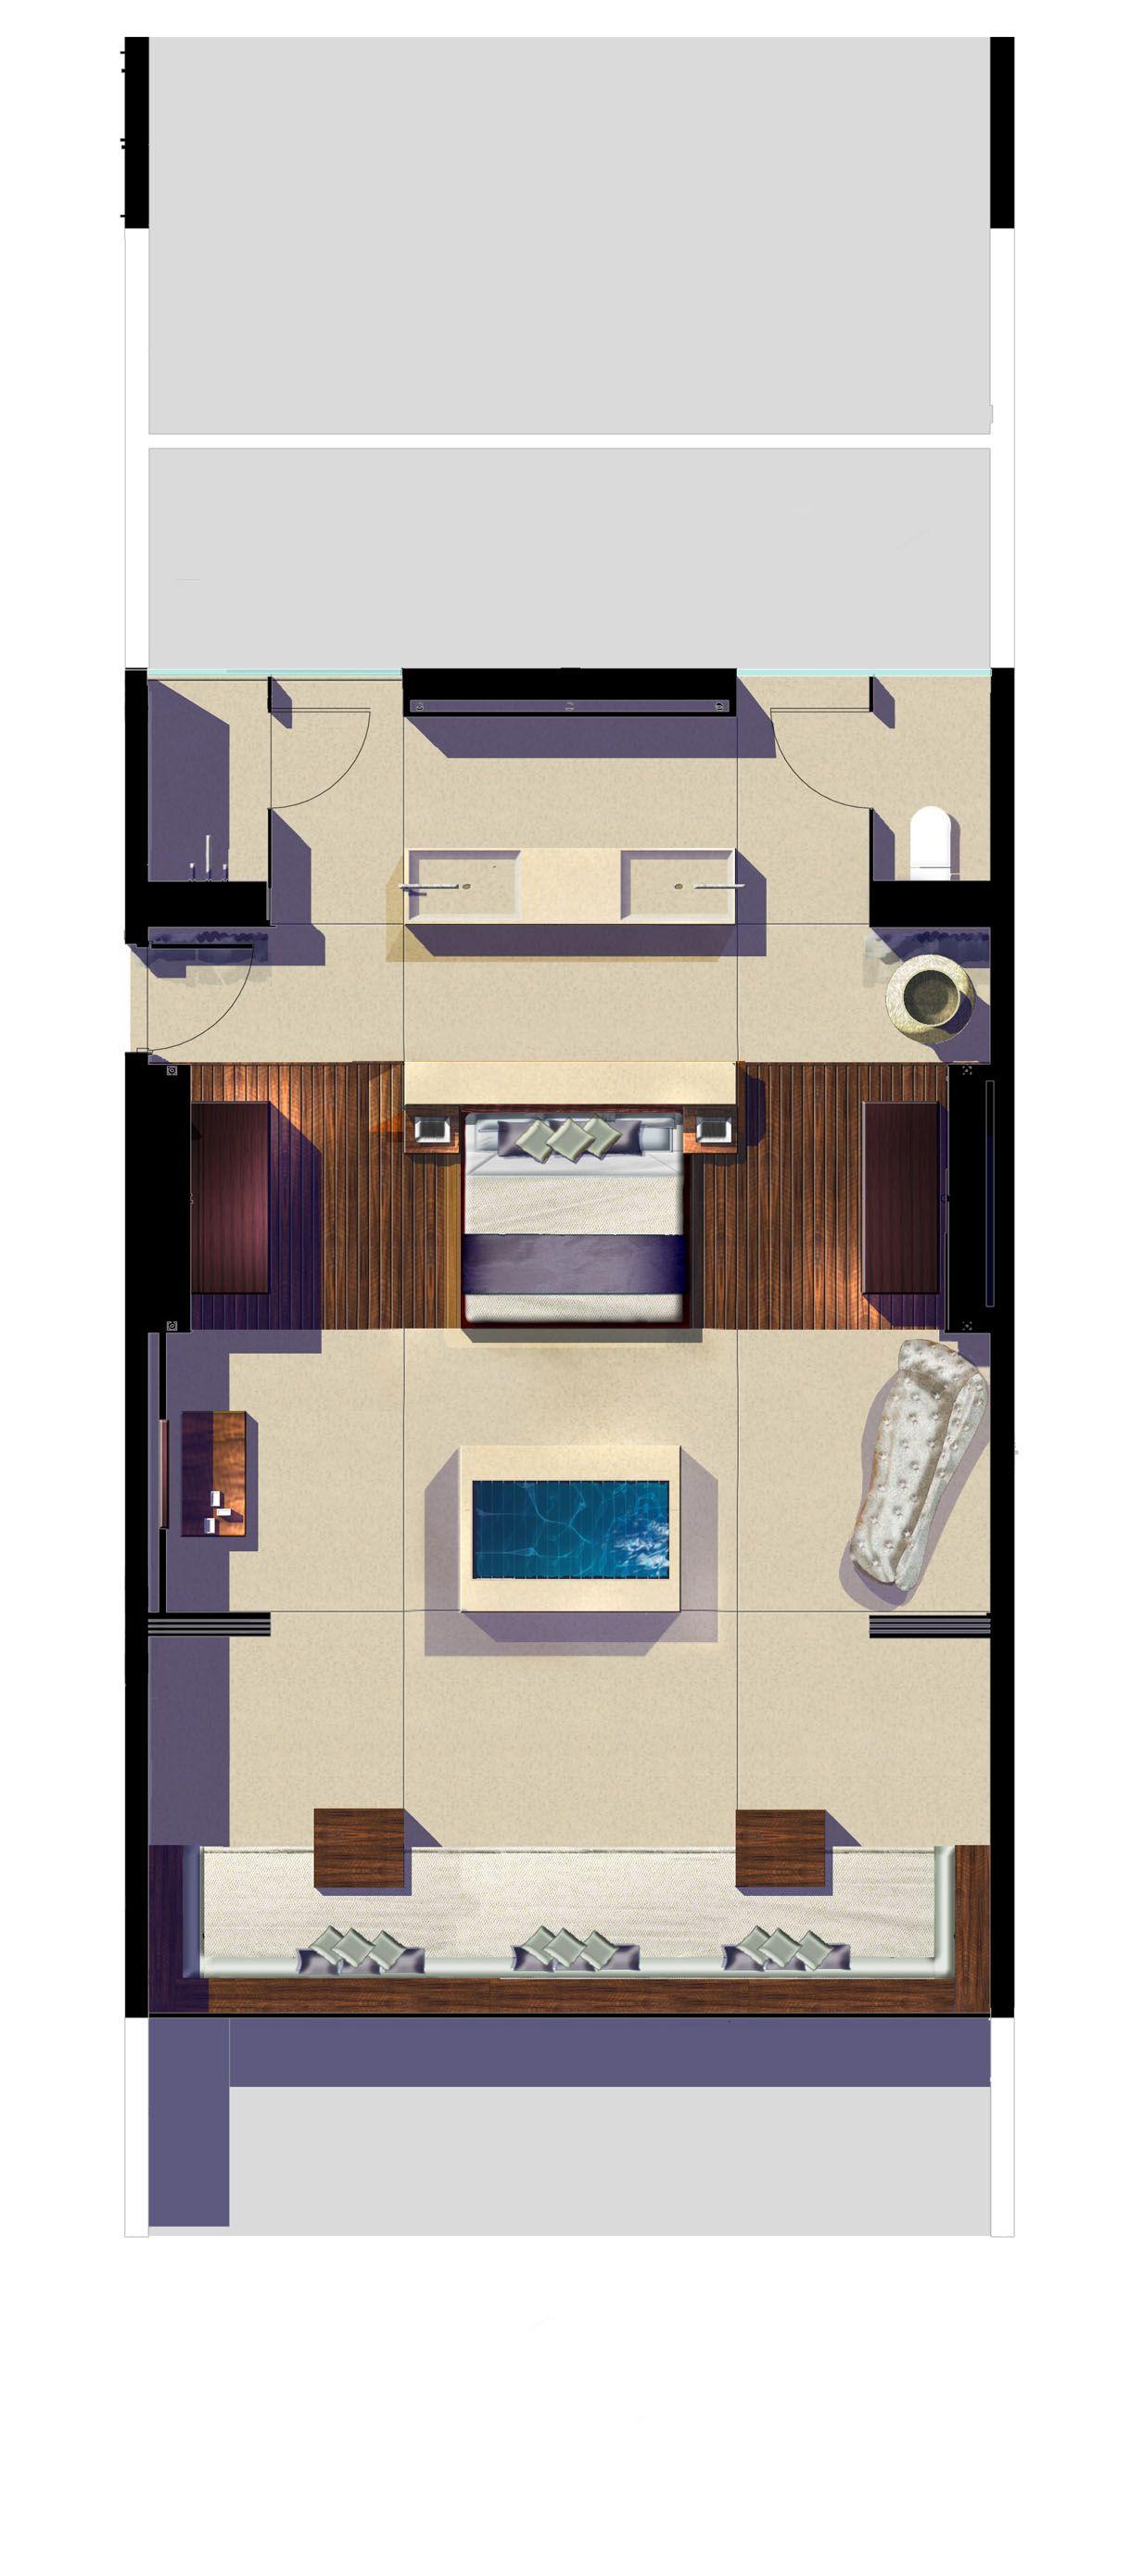 Hotel Room Plan: Hilton Hotel, Fiji Suite, Top Floor Concept Plan